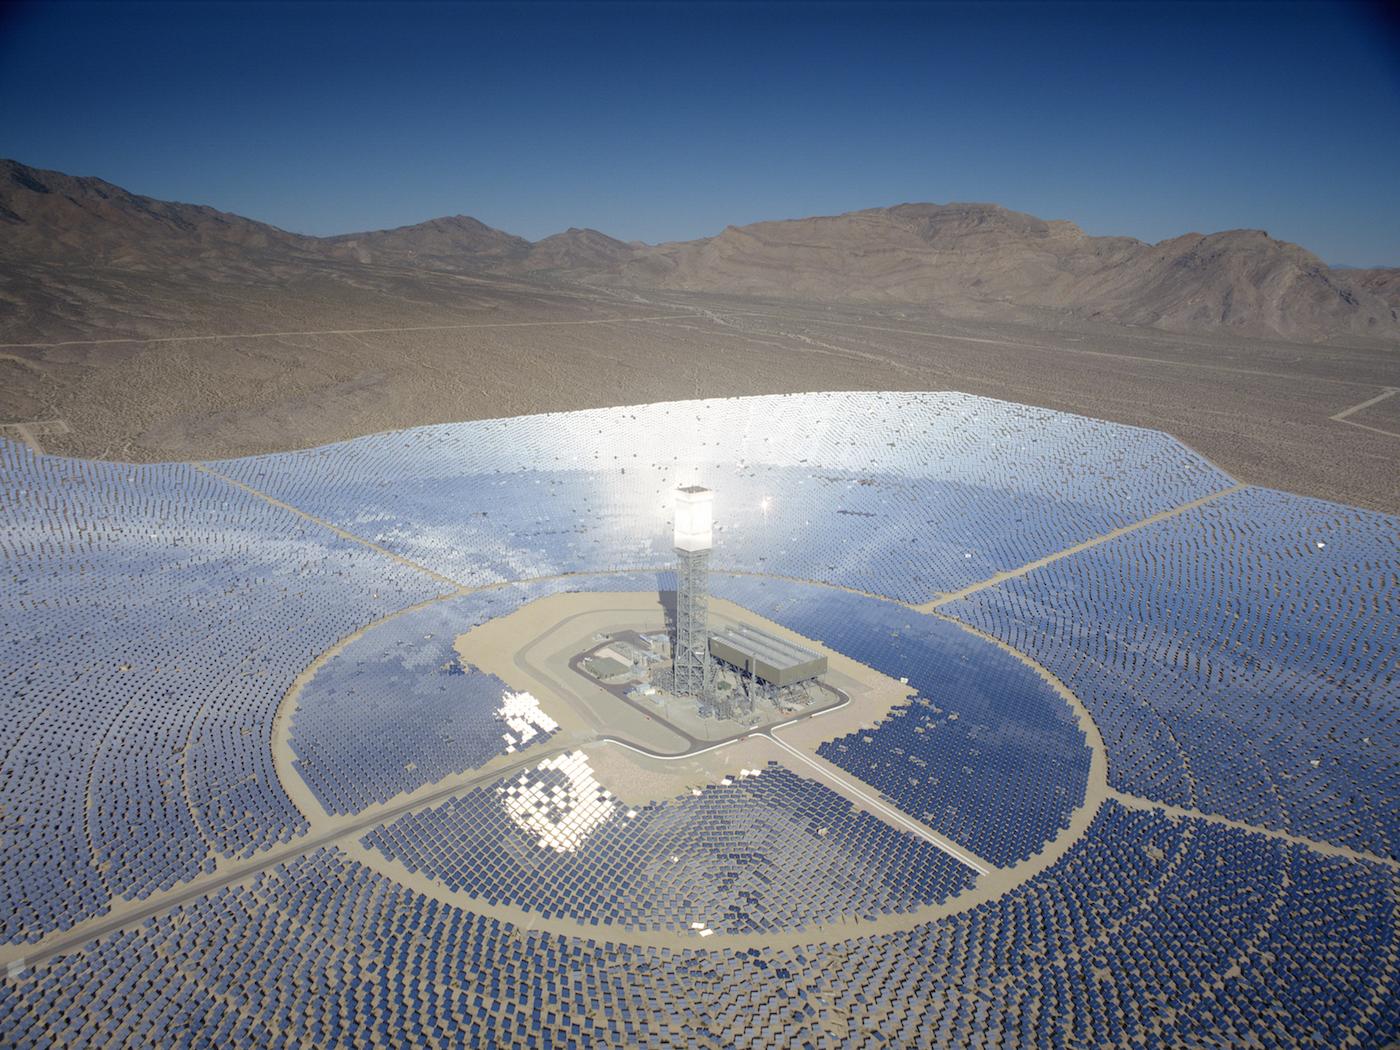 IVANPAH SOLAR ELECTRIC GENERATING SYSTEM – Dream Big ...